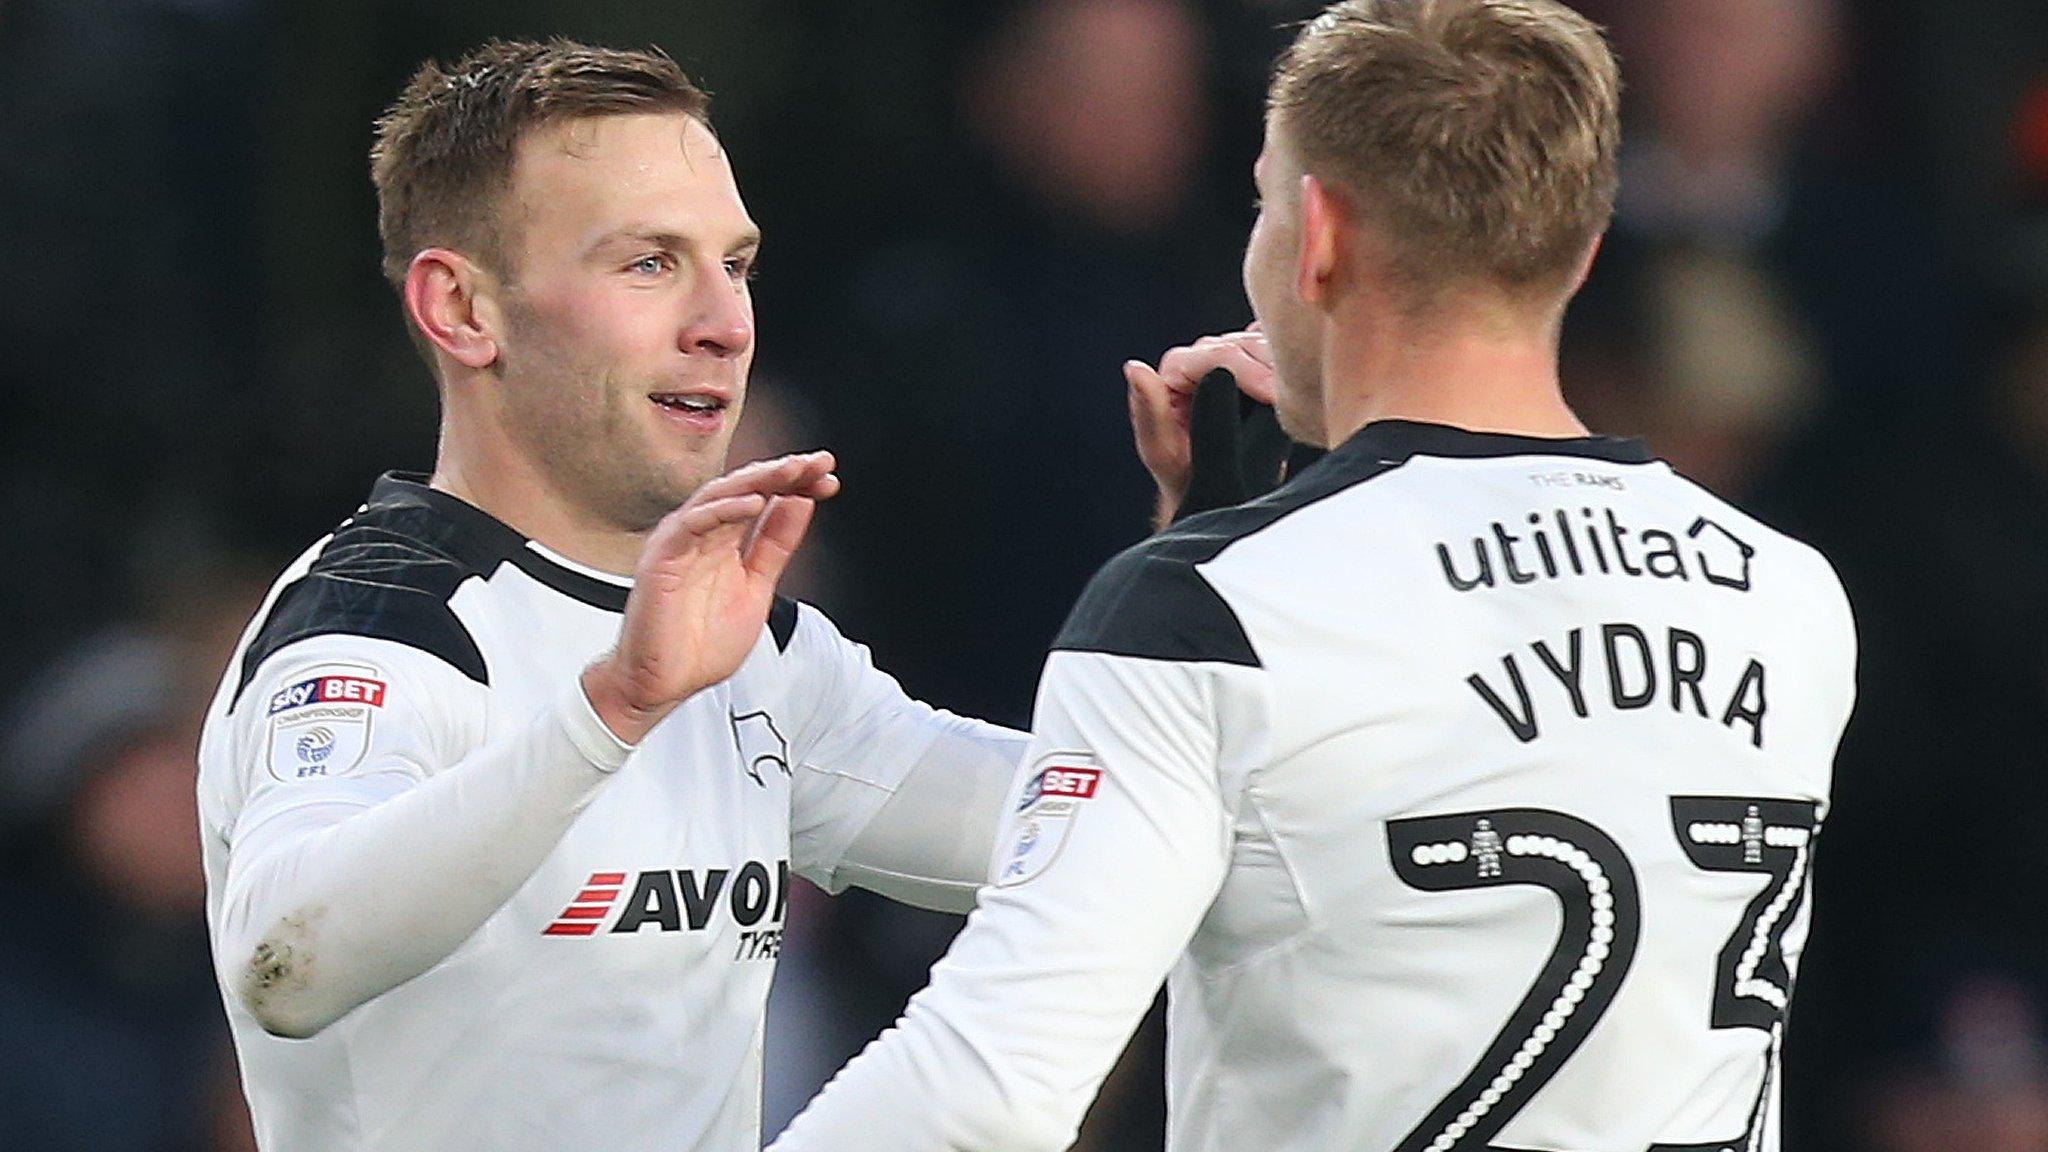 Derby beat promotion rivals Villa